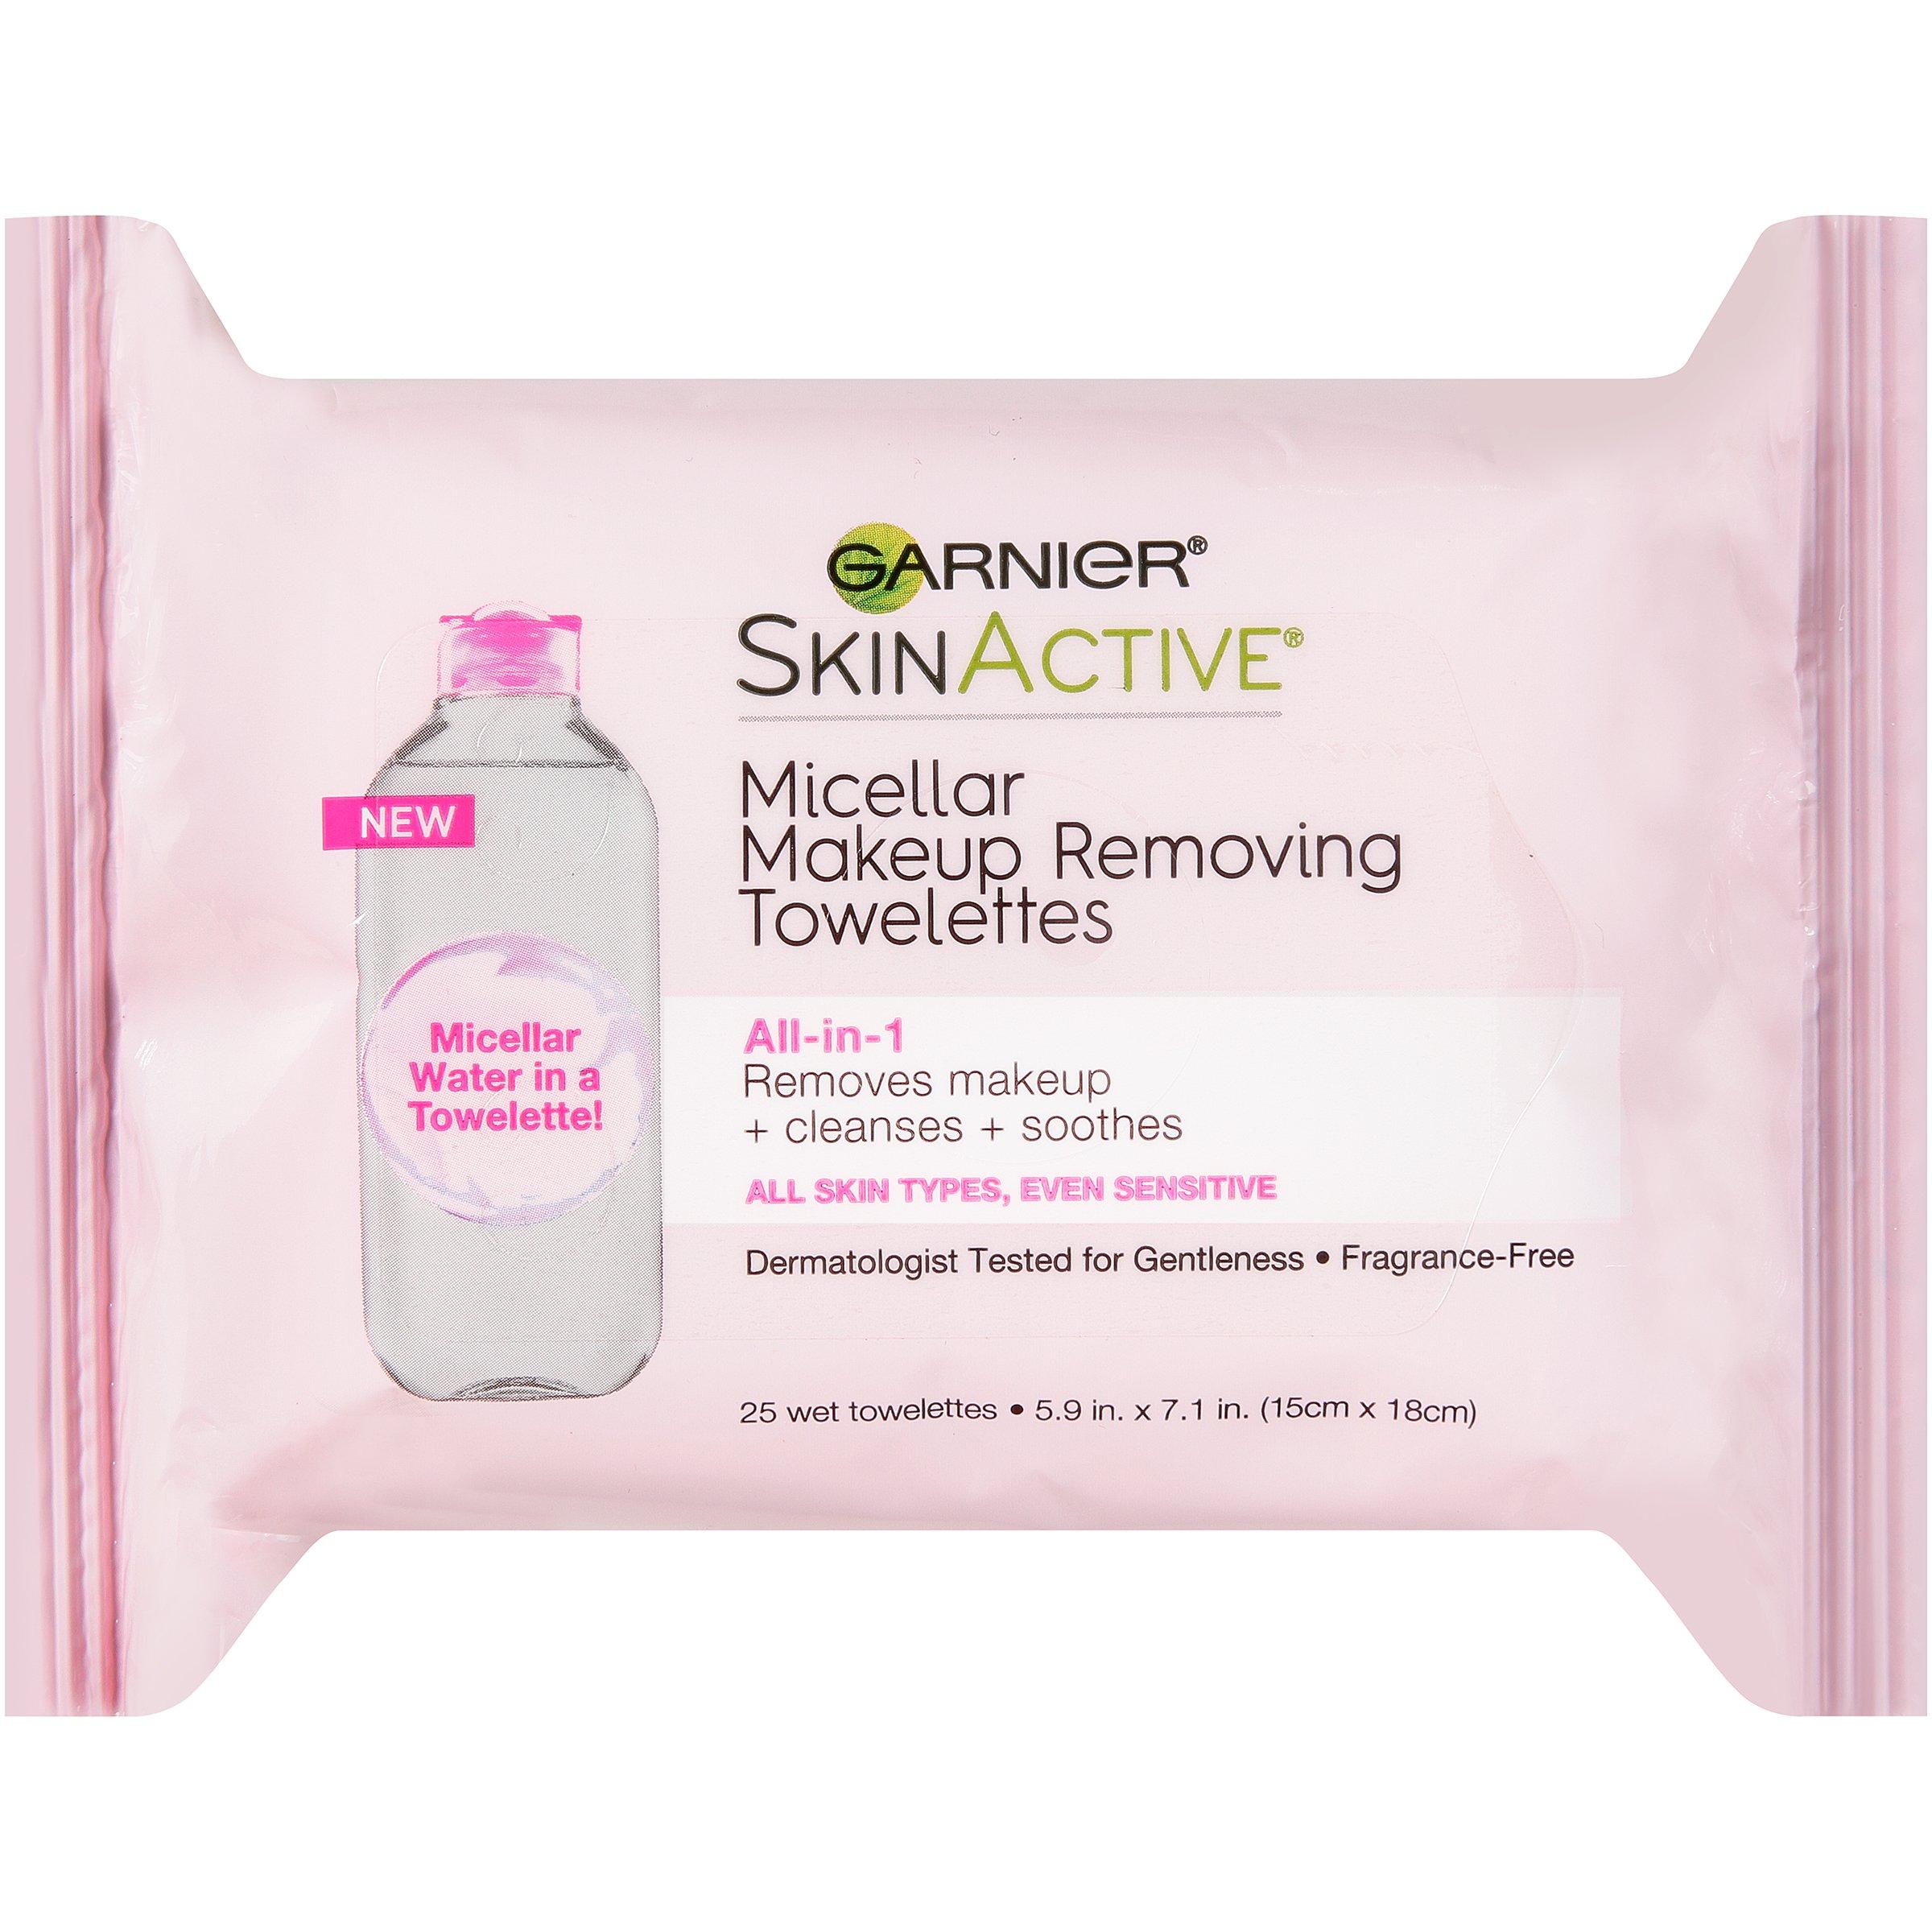 Garnier SkinActive Micellar Makeup Remover Wipes, 25 Count